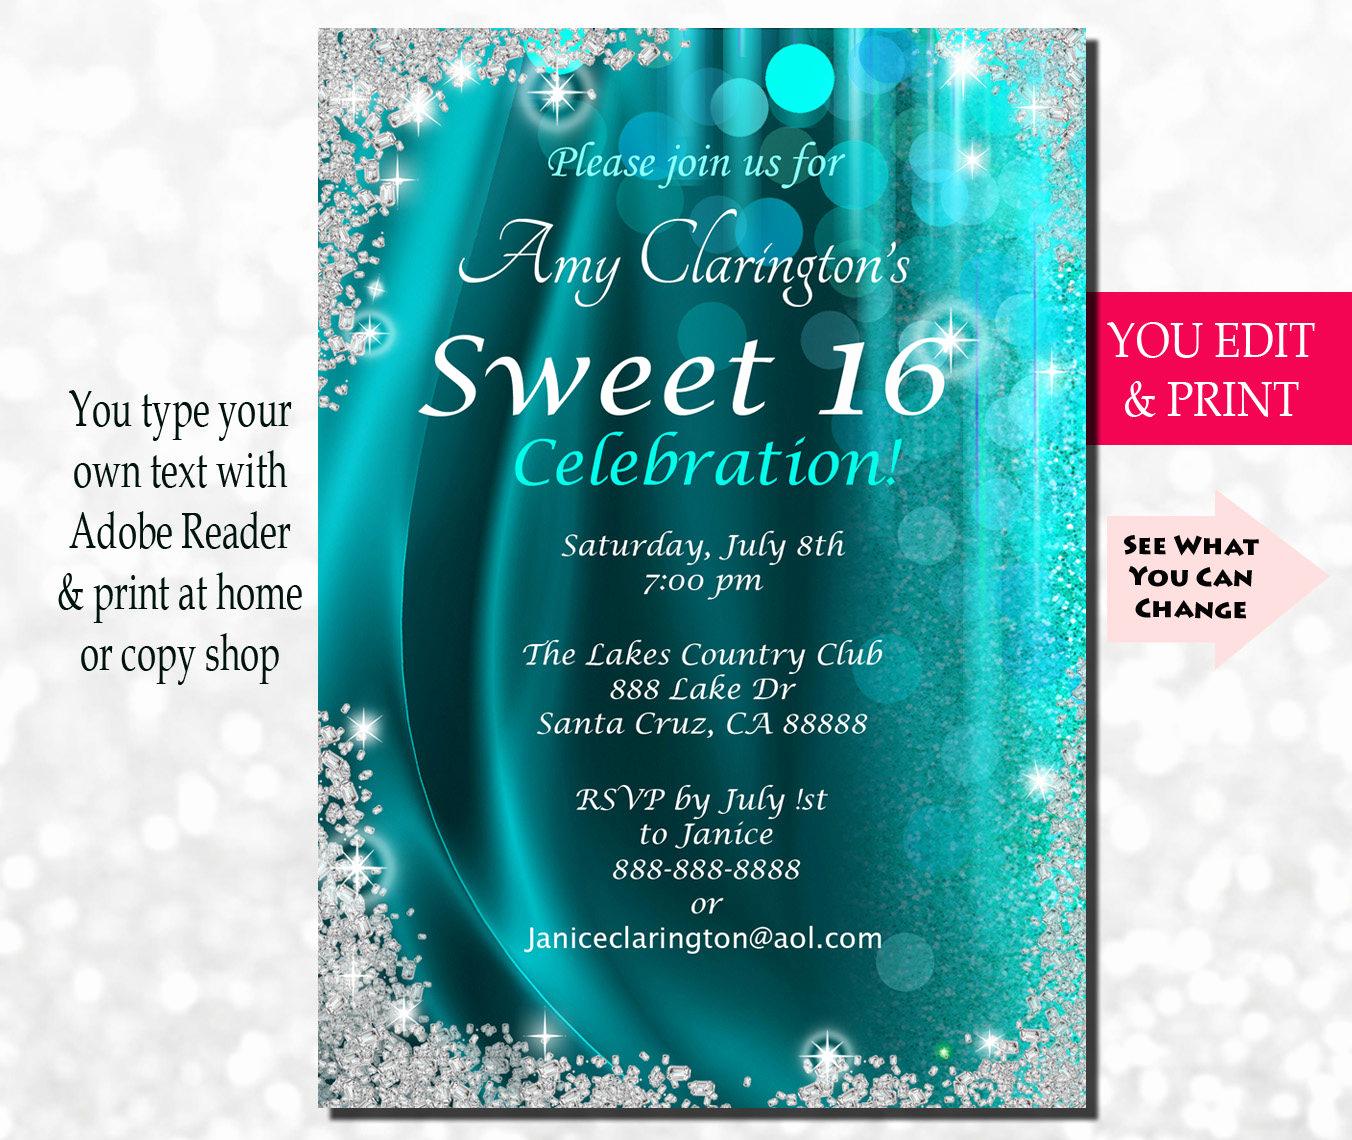 Sweet 16 Invitation Wording Unique Sweet Sixteen Invitation Sweet Sixteen Party Invitation